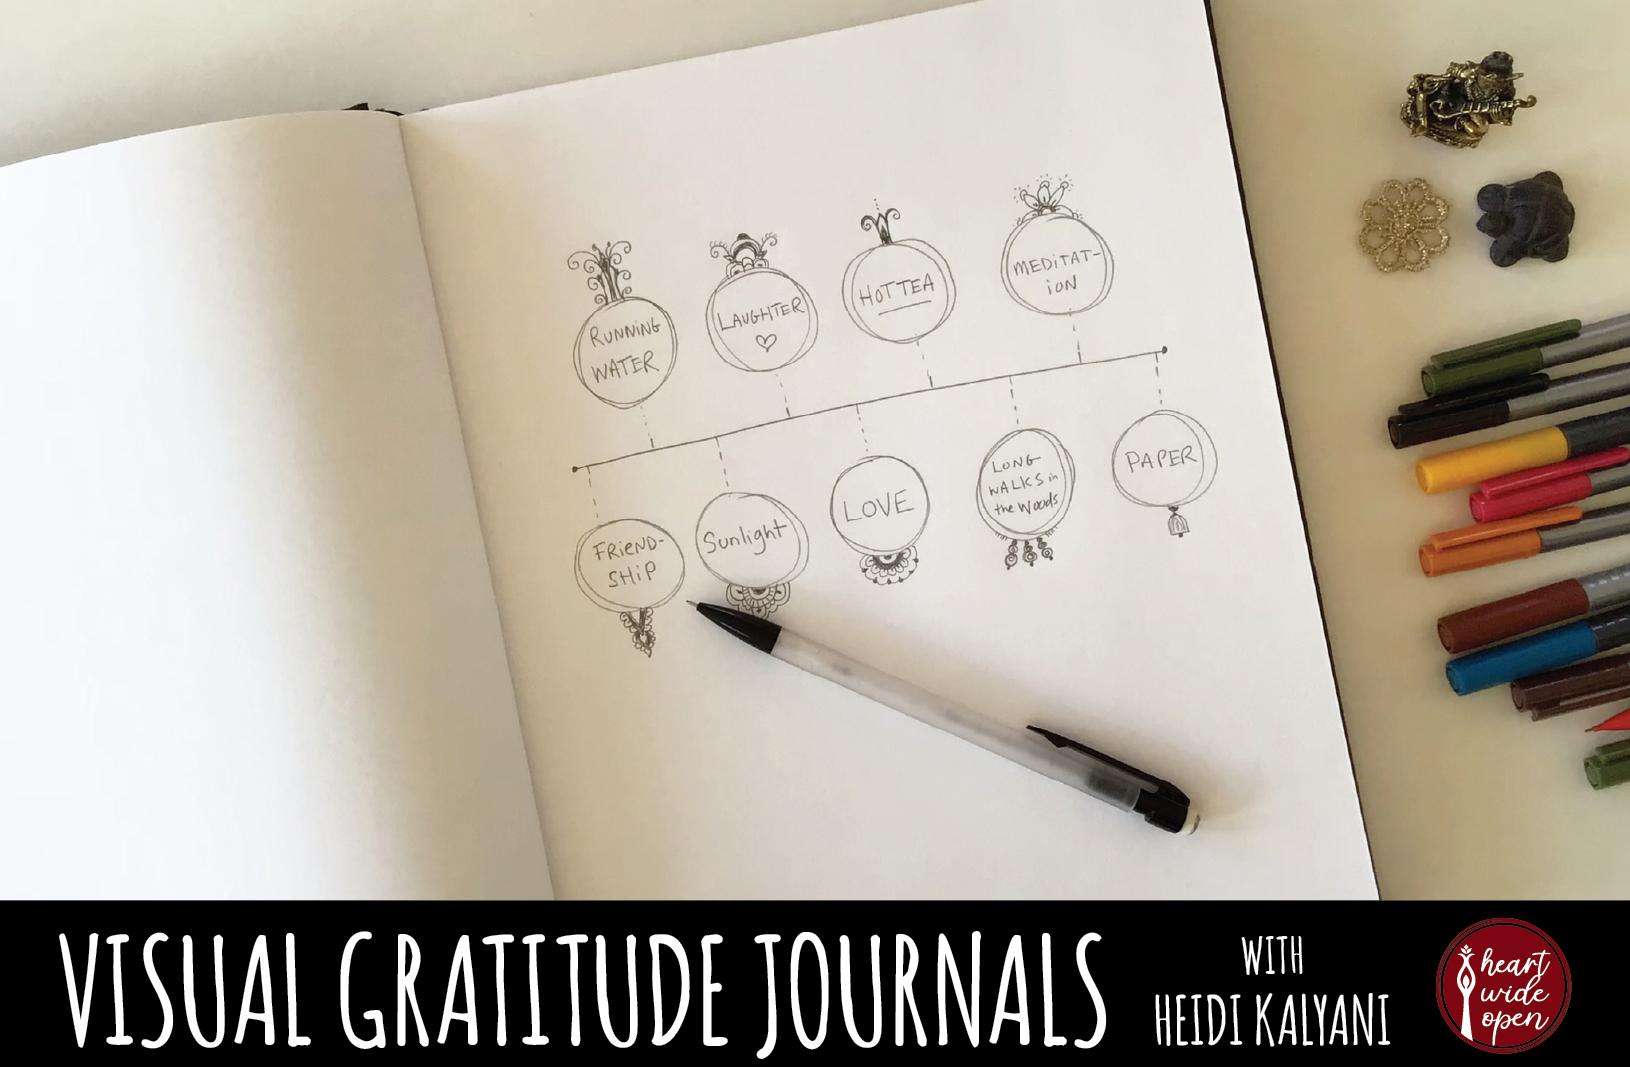 Visual Gratitude Journals